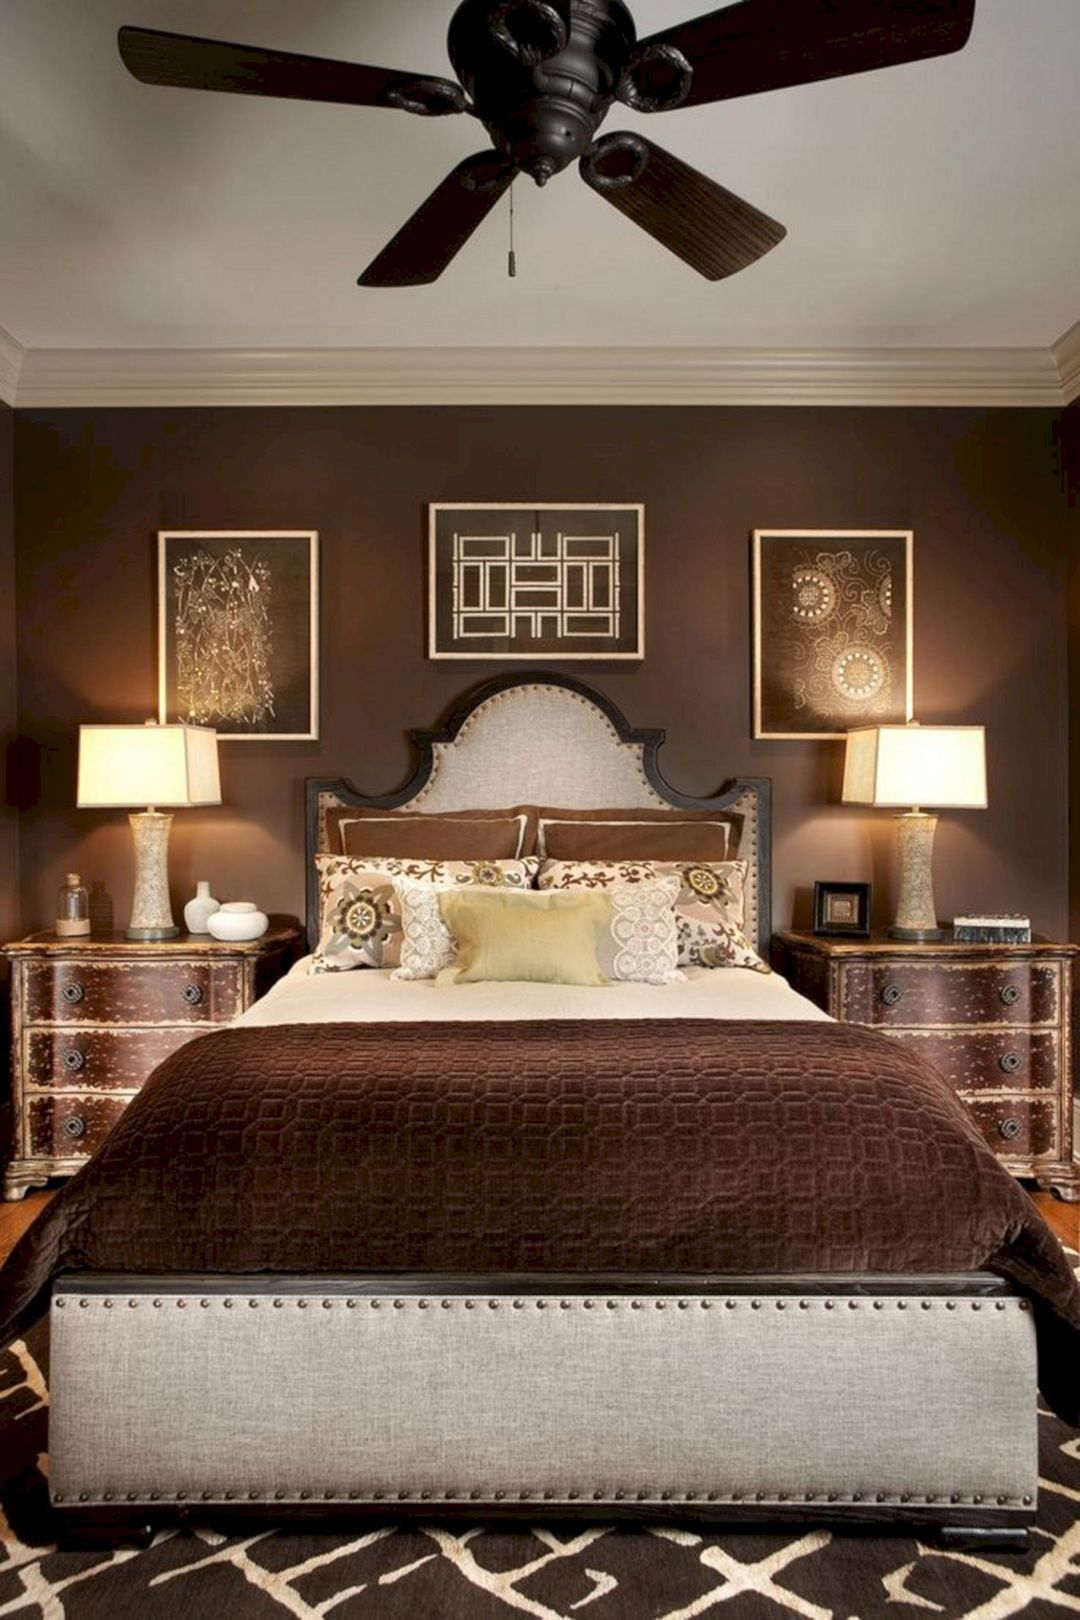 35 Marvelous Brown Painted Bedroom Walls Decoration Decor Gardening Ideas Brown Furniture Bedroom Brown Bedroom Chocolate Brown Bedrooms